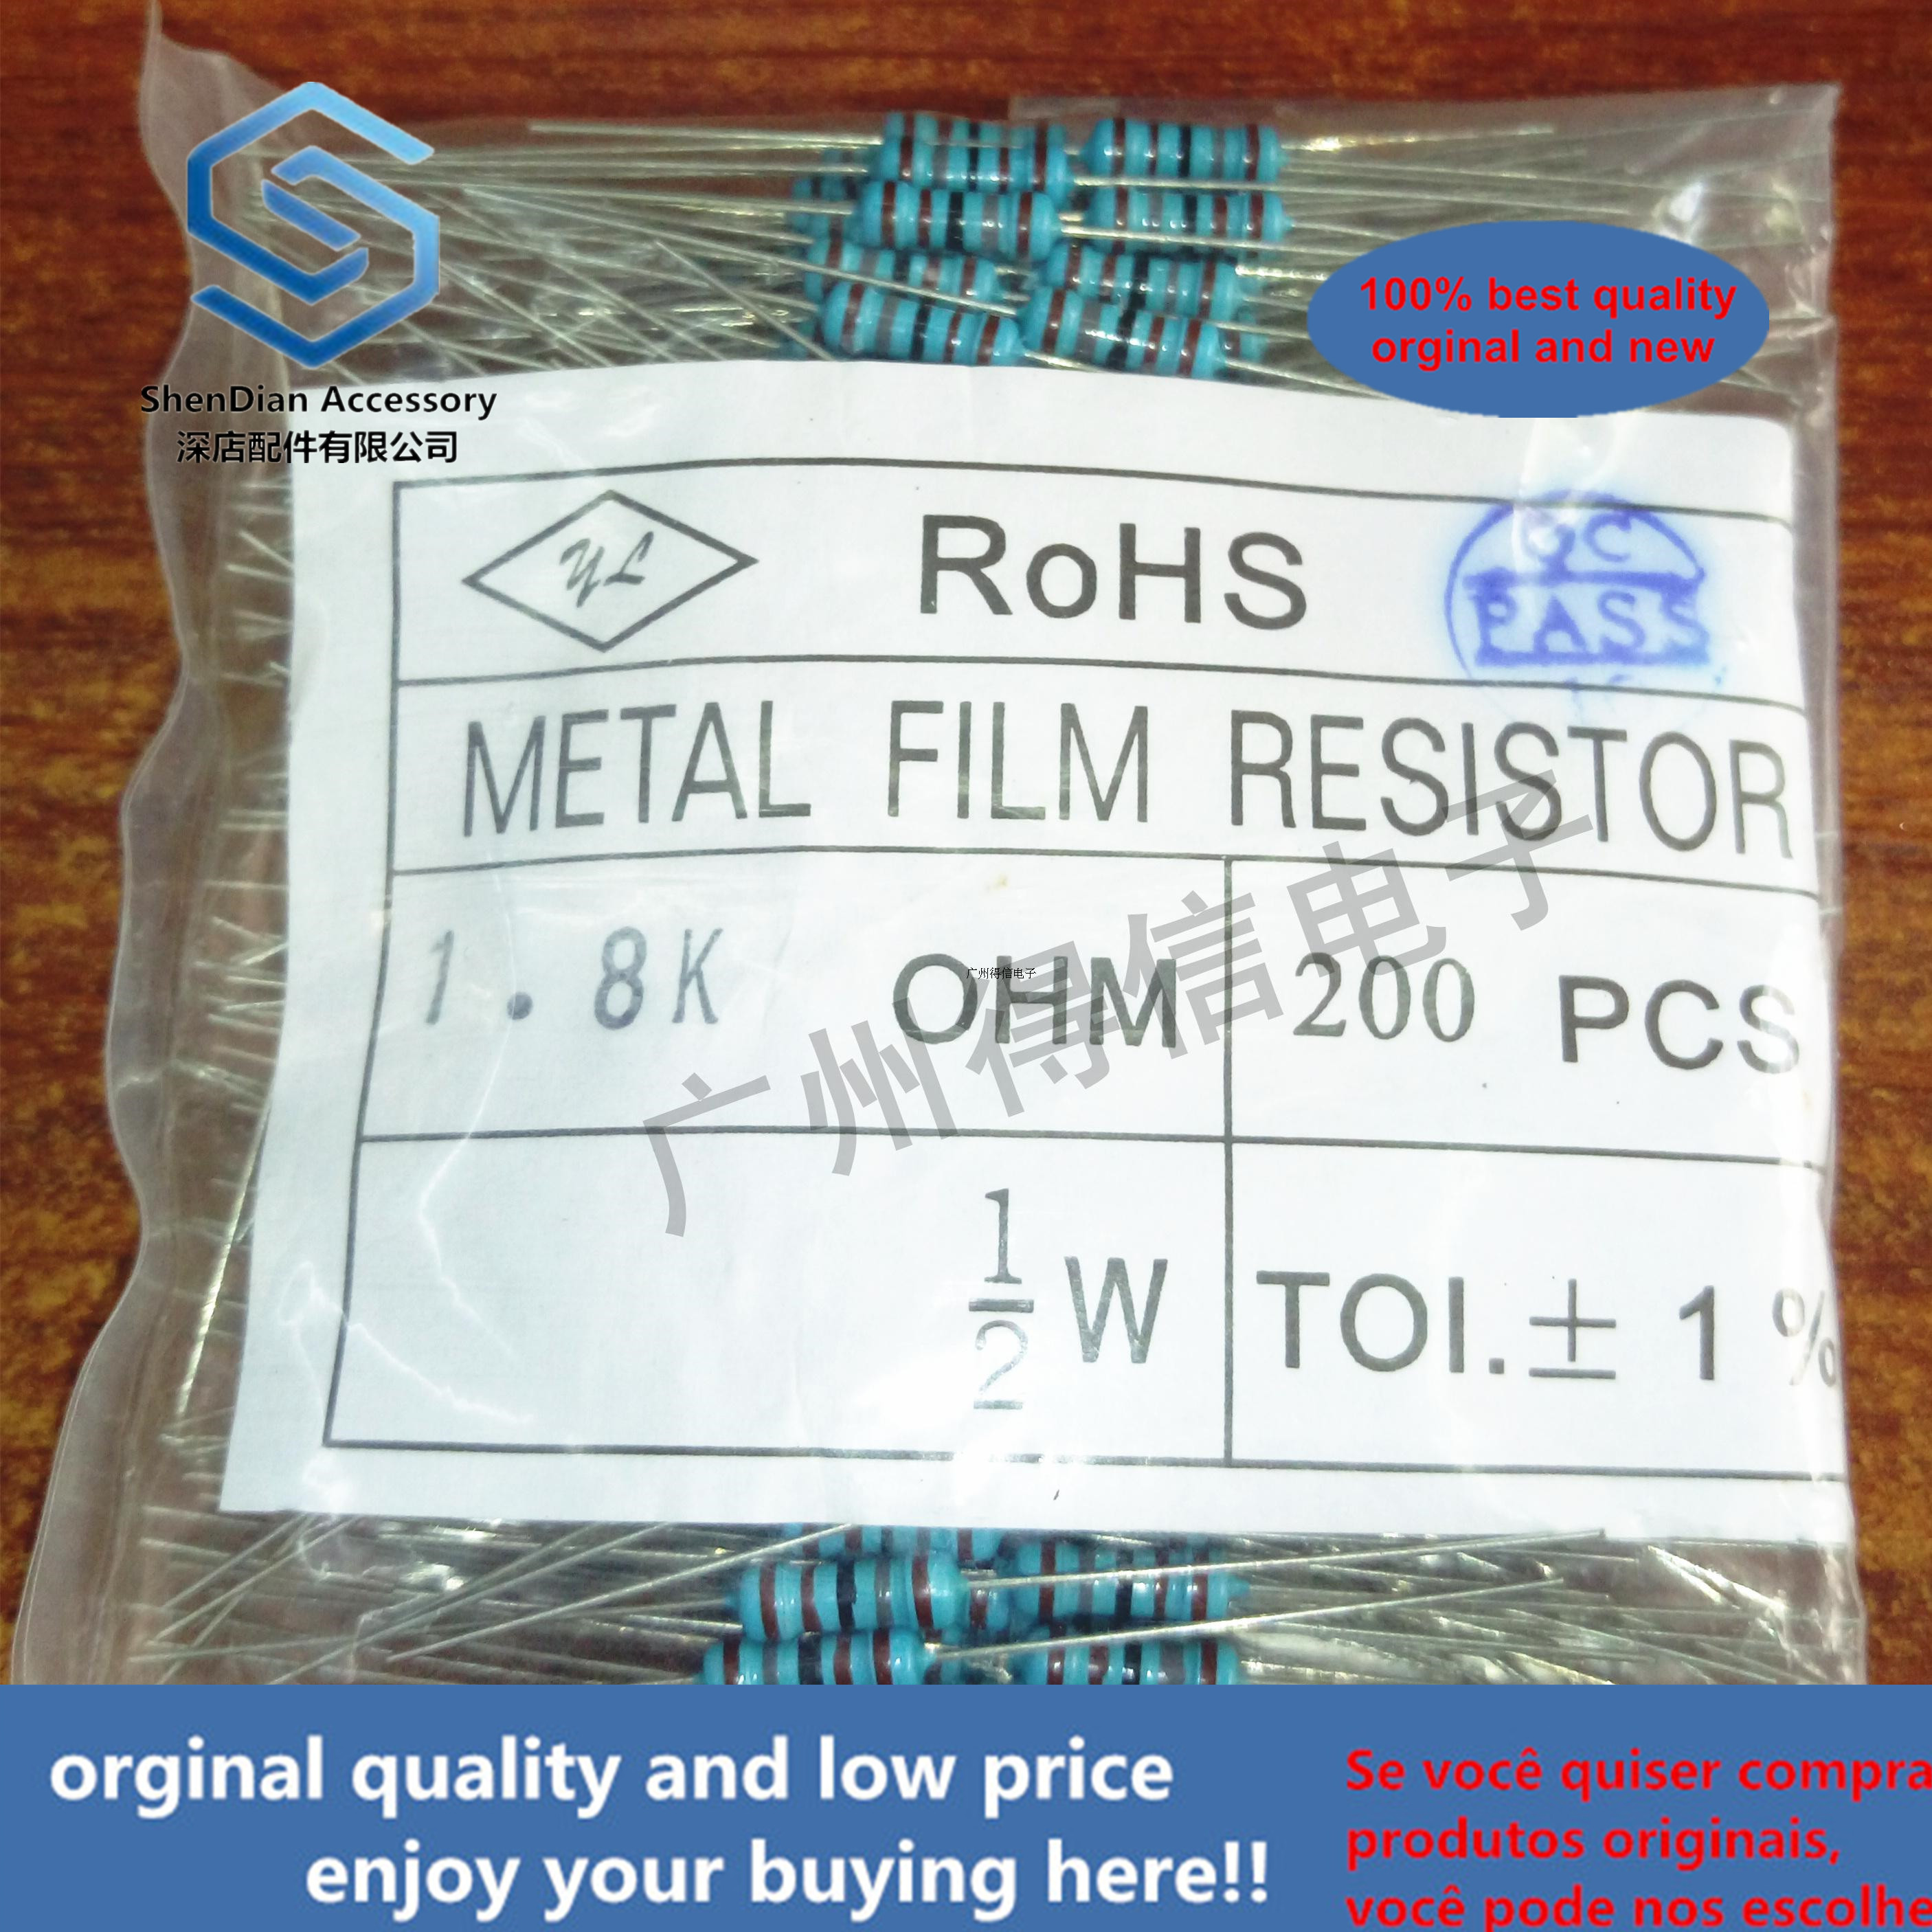 200pcs 1 / 2W 270R 270 Euro 1% Brand New Metal Film Iron Feet Resistor Bag 200 Pcs Per Pack